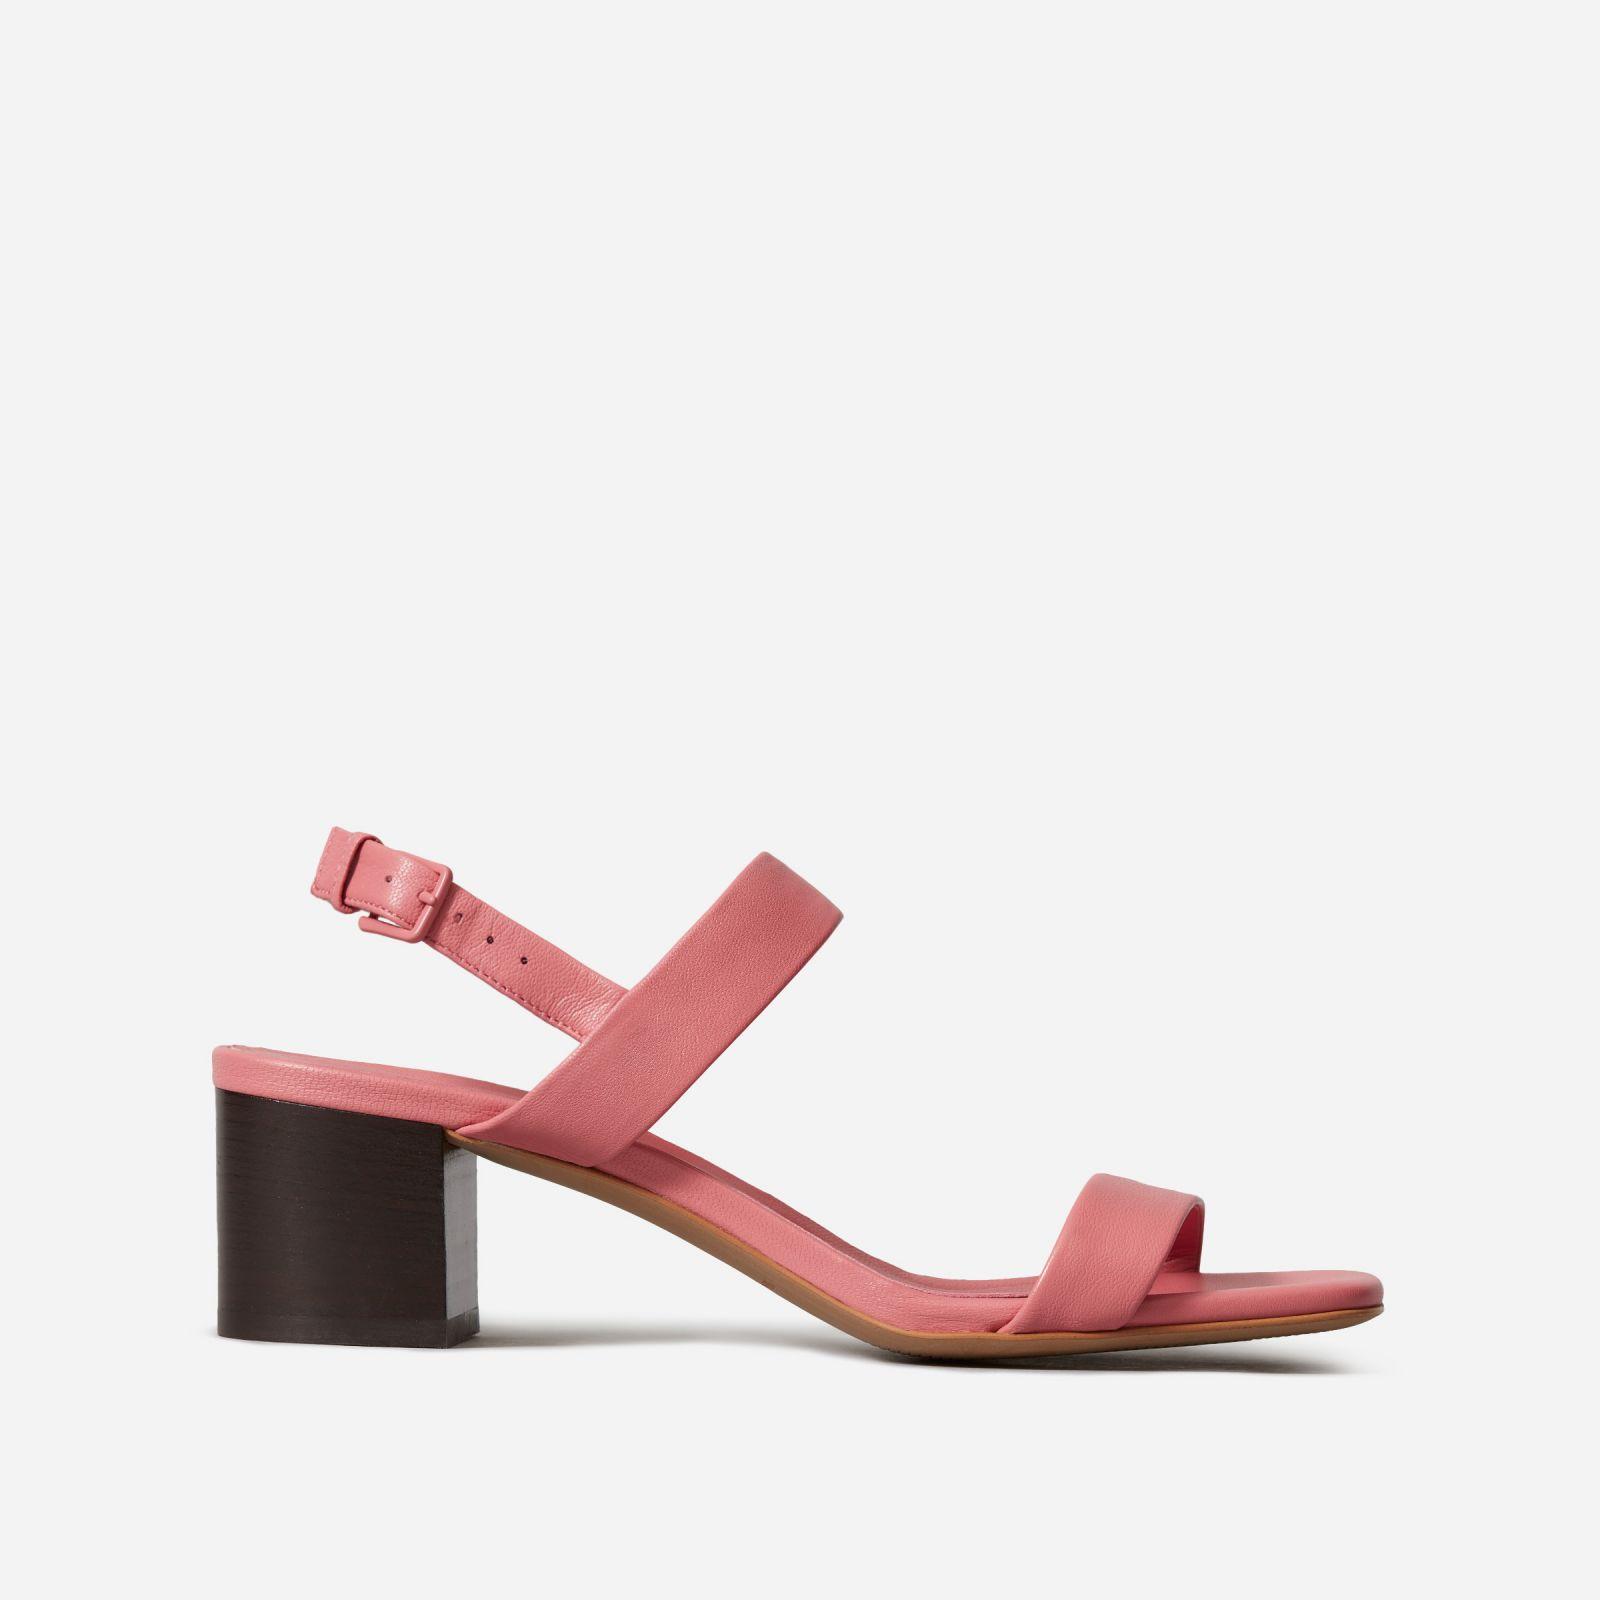 women's double-strap block heel sandal by everlane in strawberry, size 11